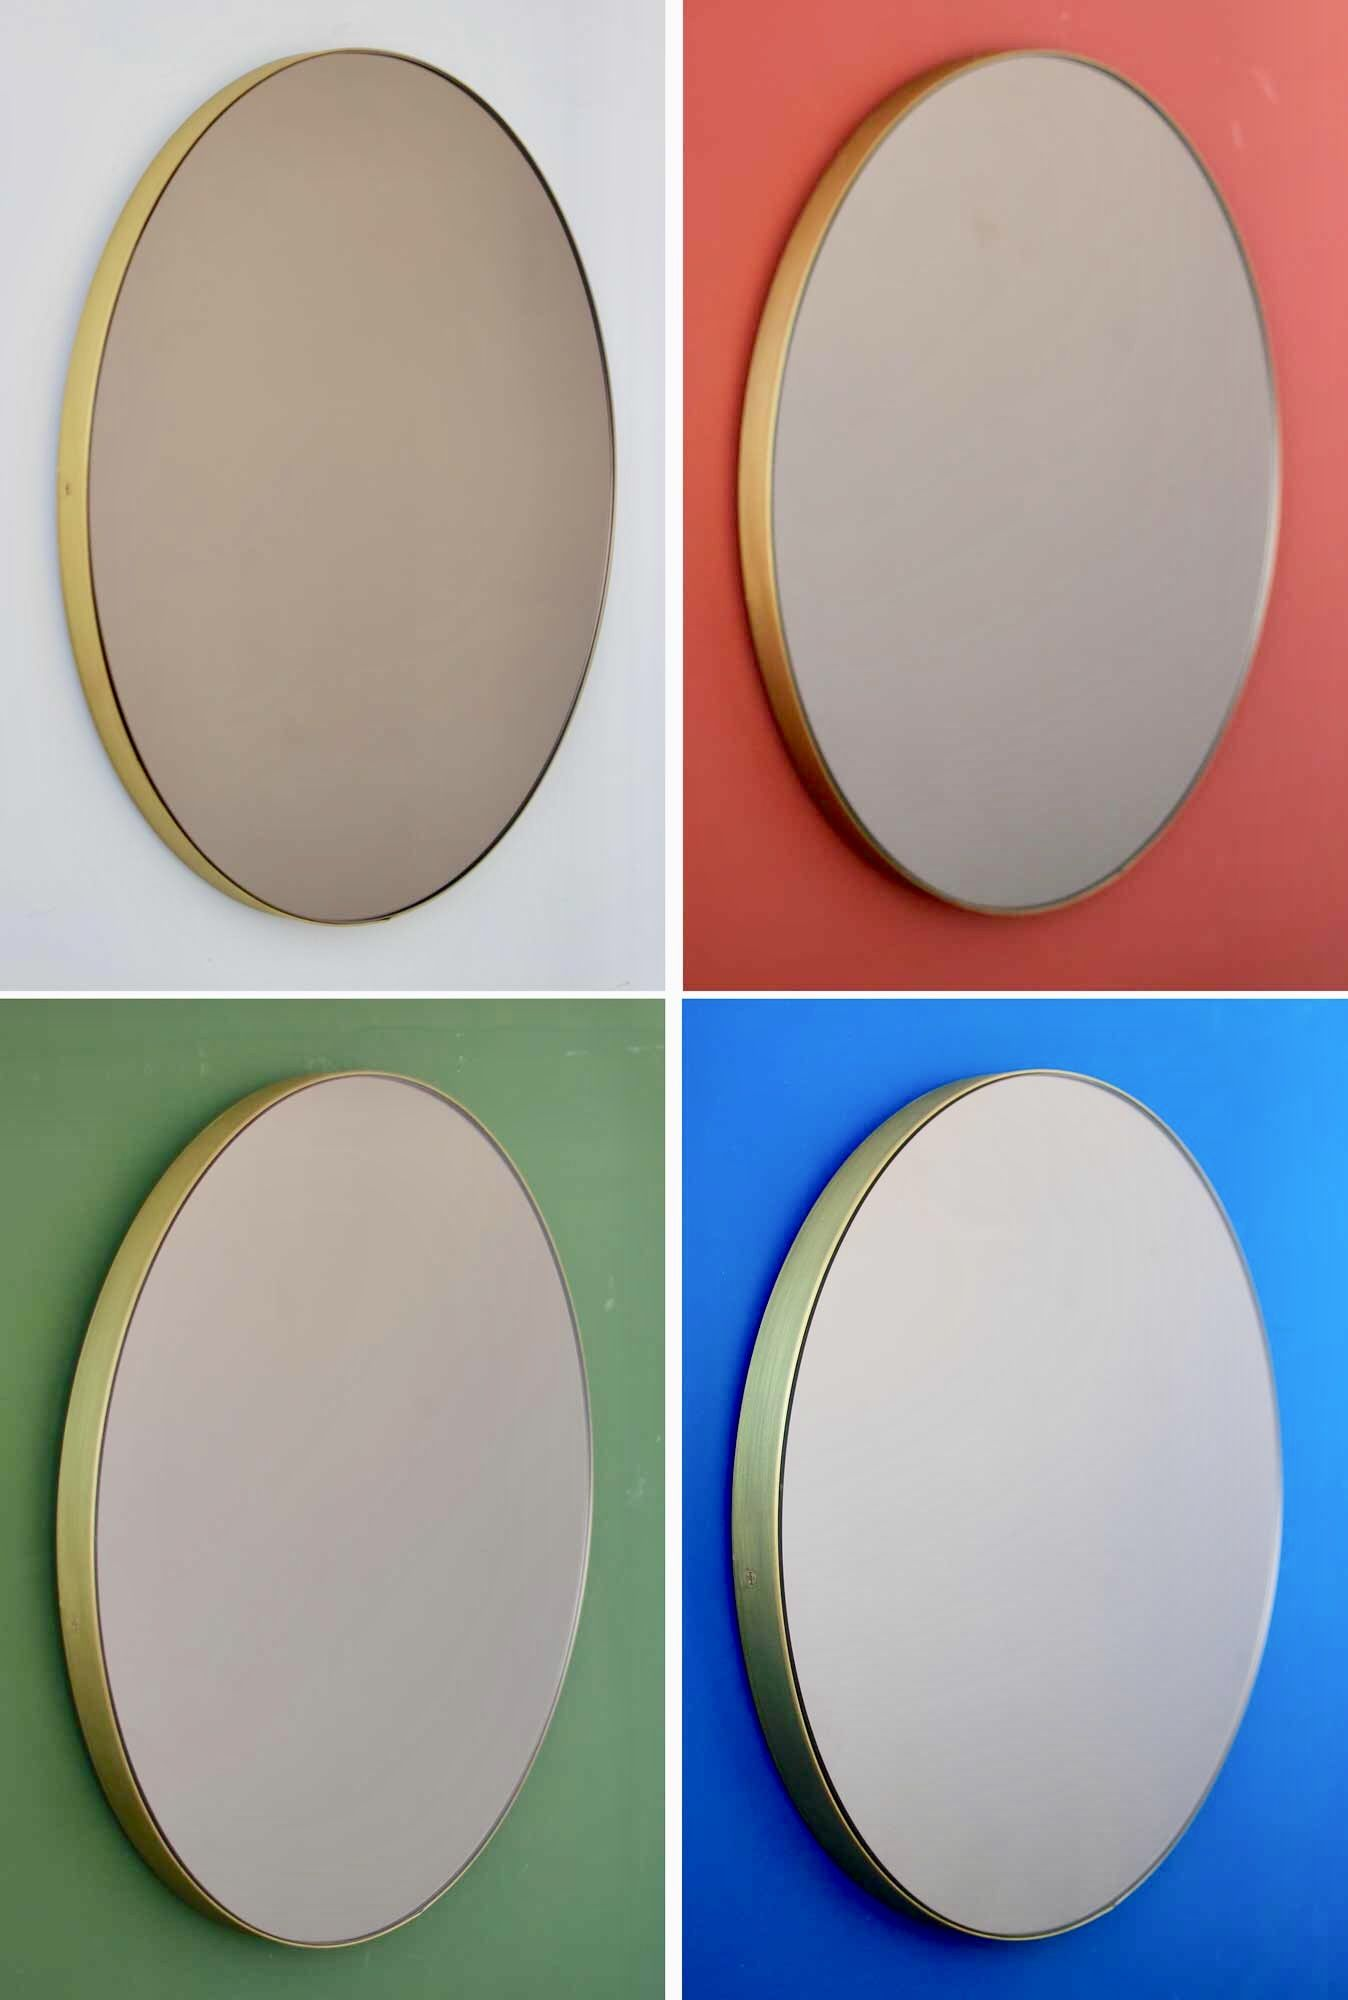 Hallway mirror kmart  Pin by Alguacil u Perkoff Ltd on Round Mirrors  Pinterest  Round